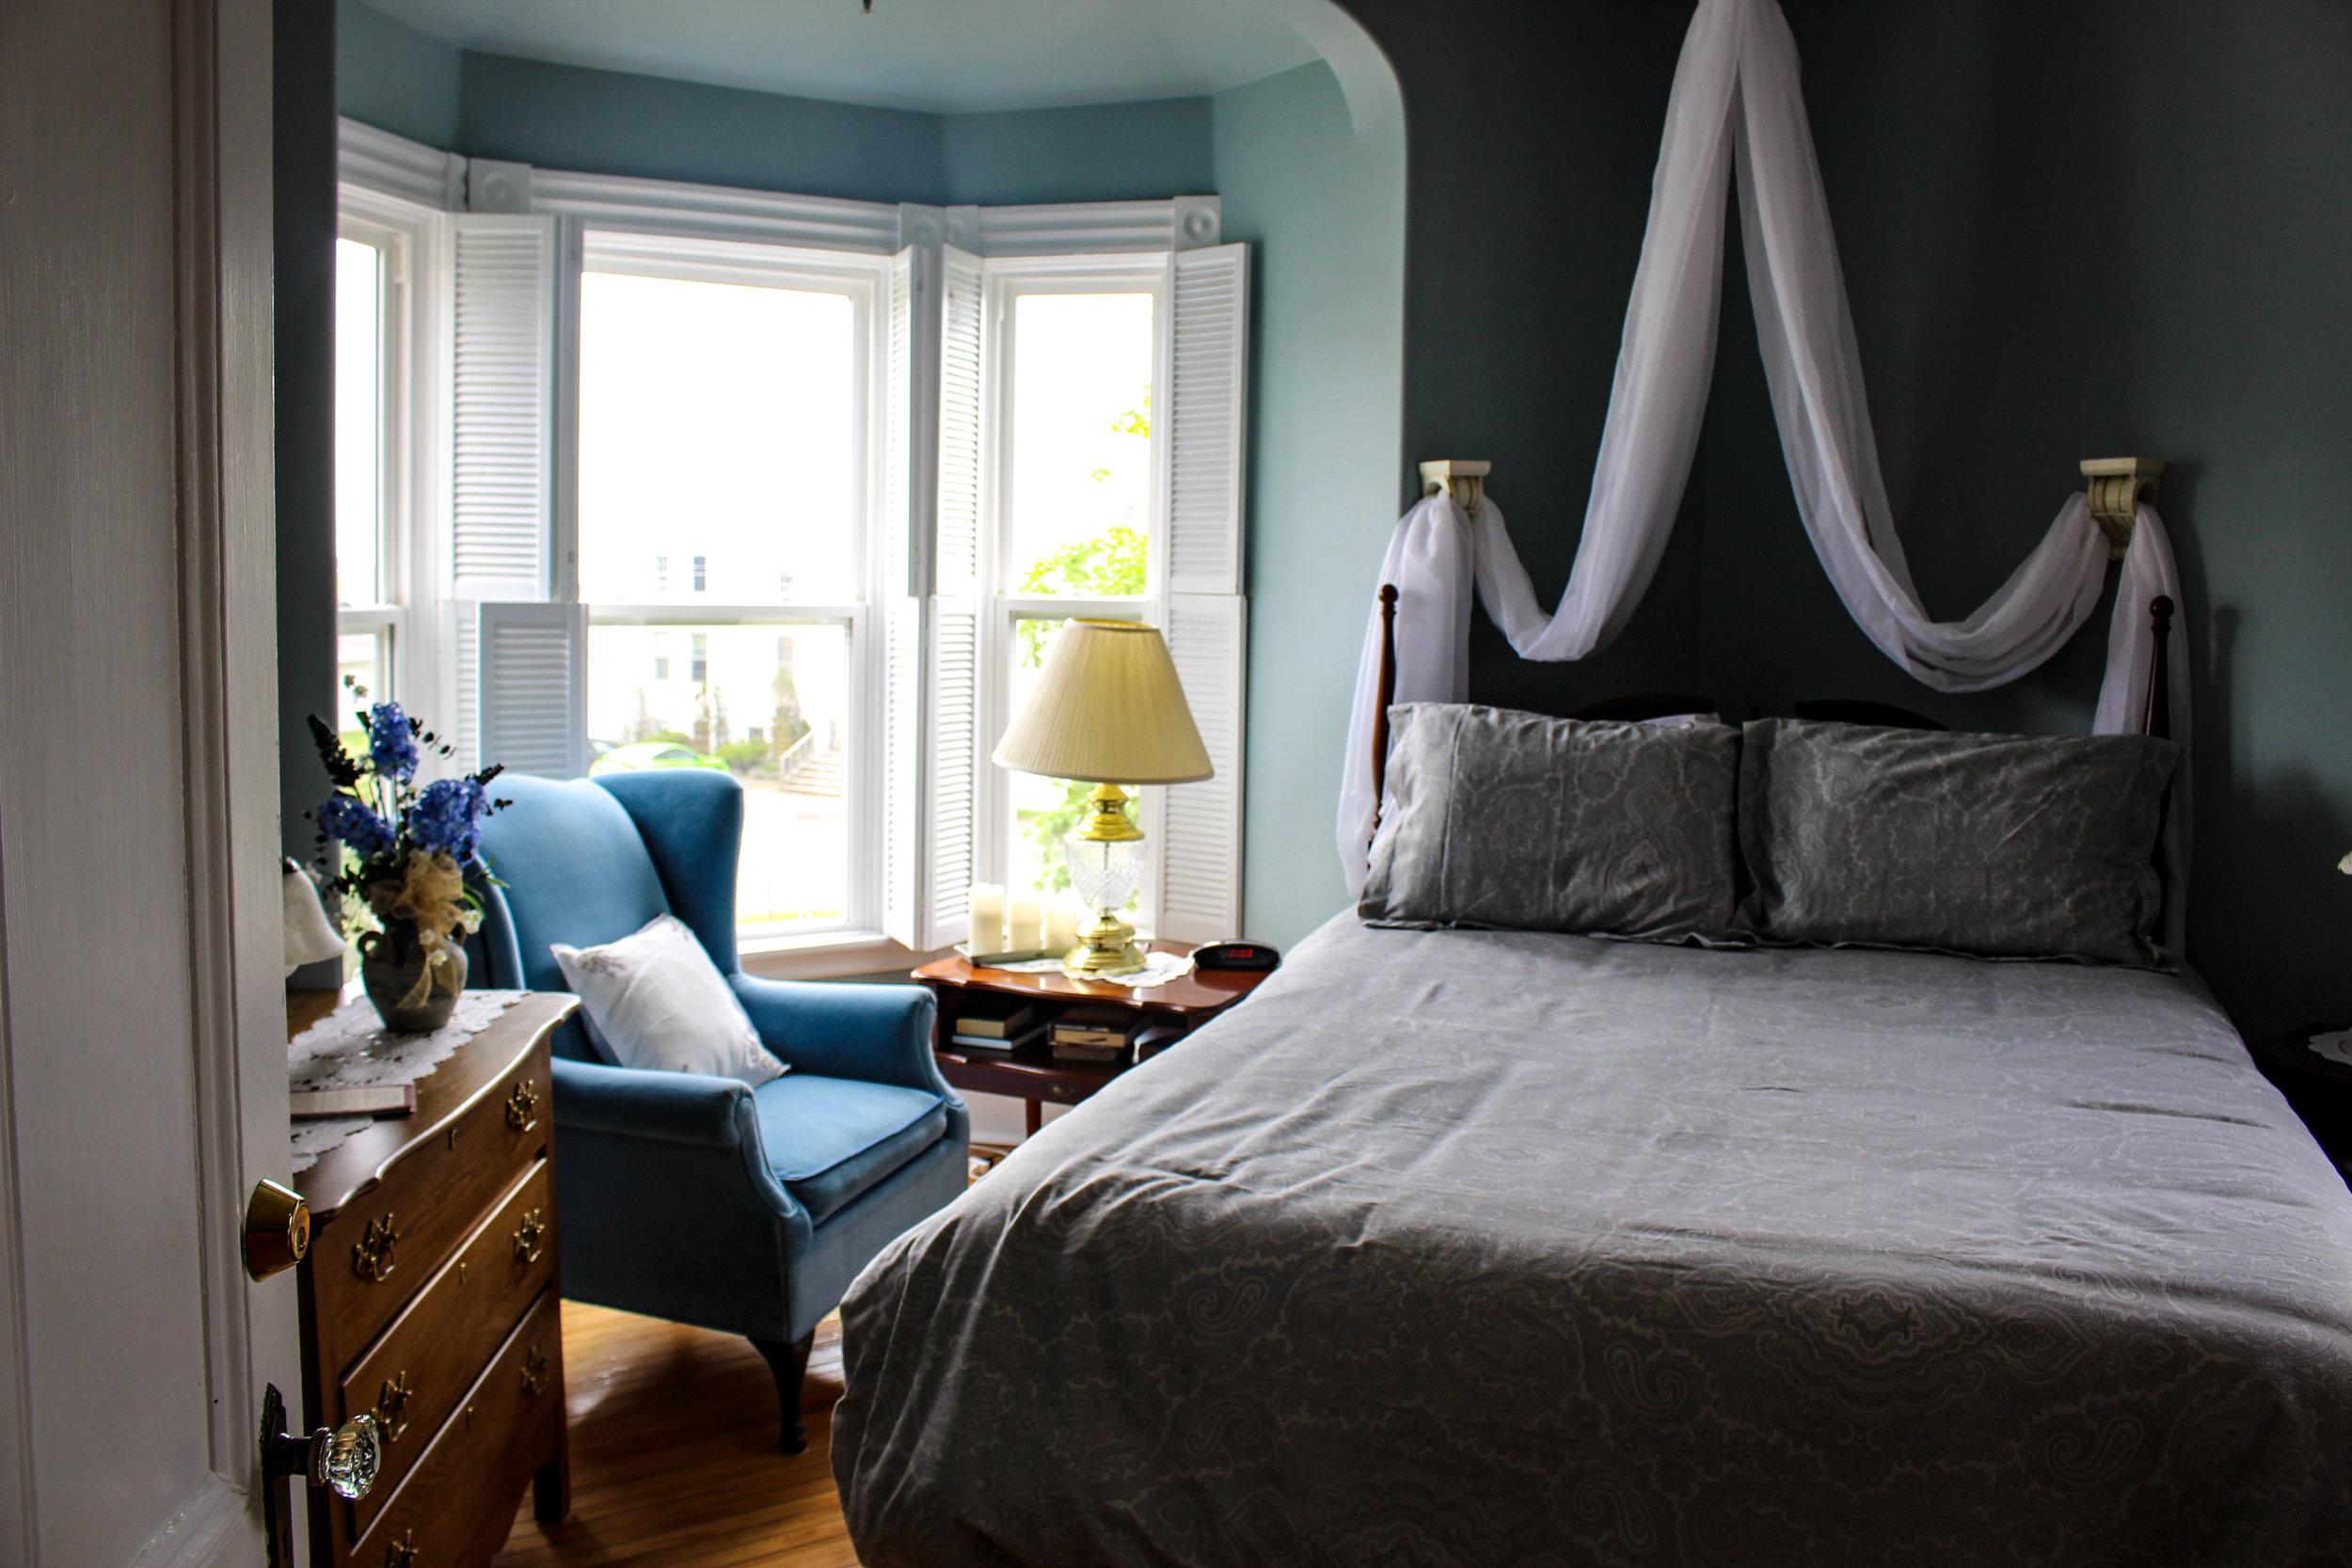 203 Basin Head Suite - Price $189.50/Night